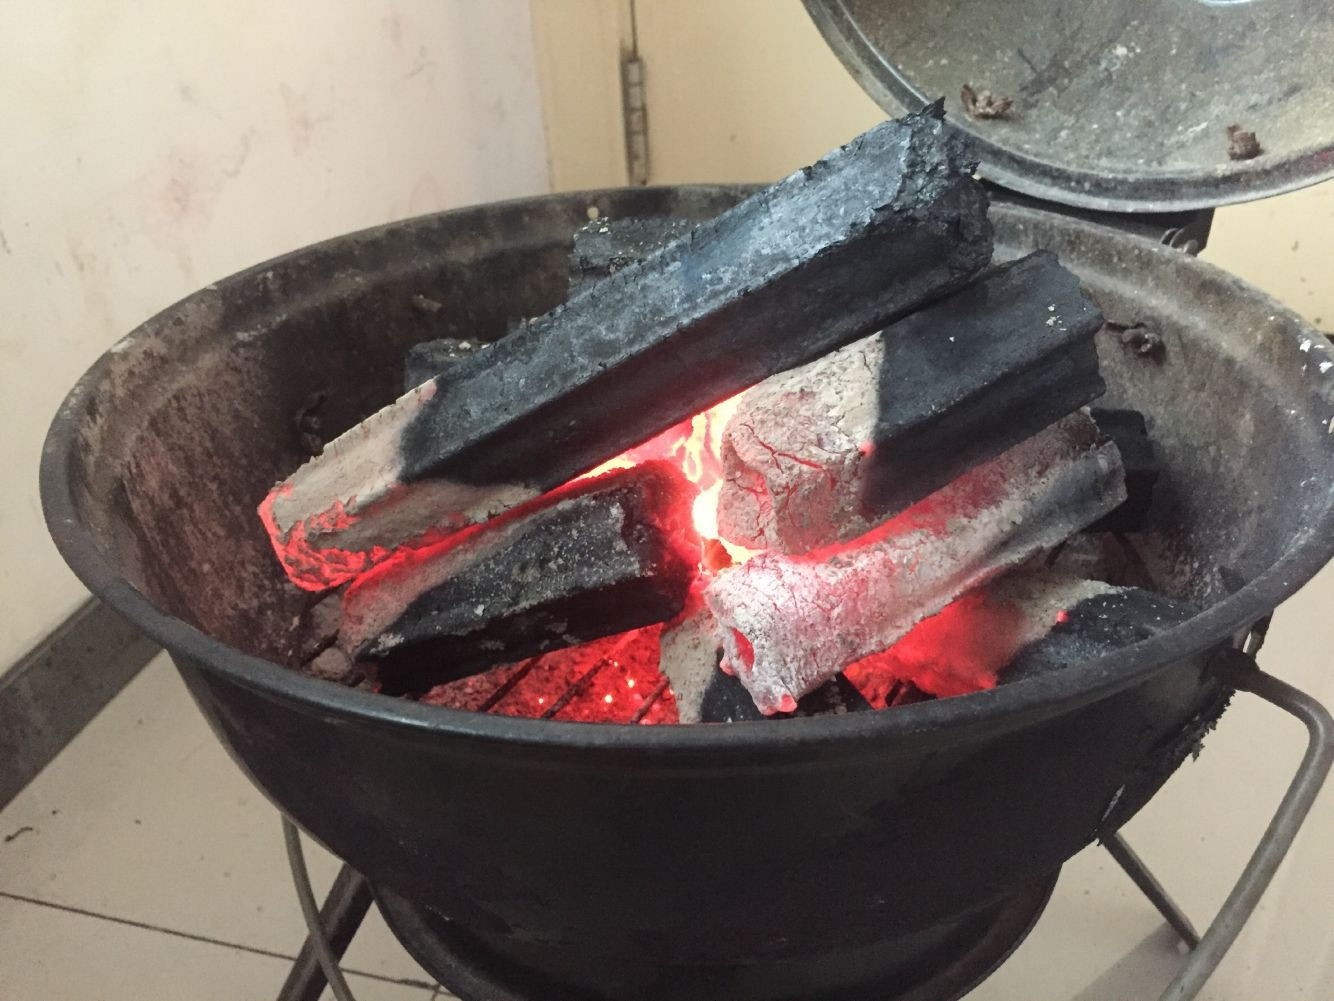 HQBQ0006 HongQiang Long Burning Time Barbecue Cooking Wood Sawdust Coal